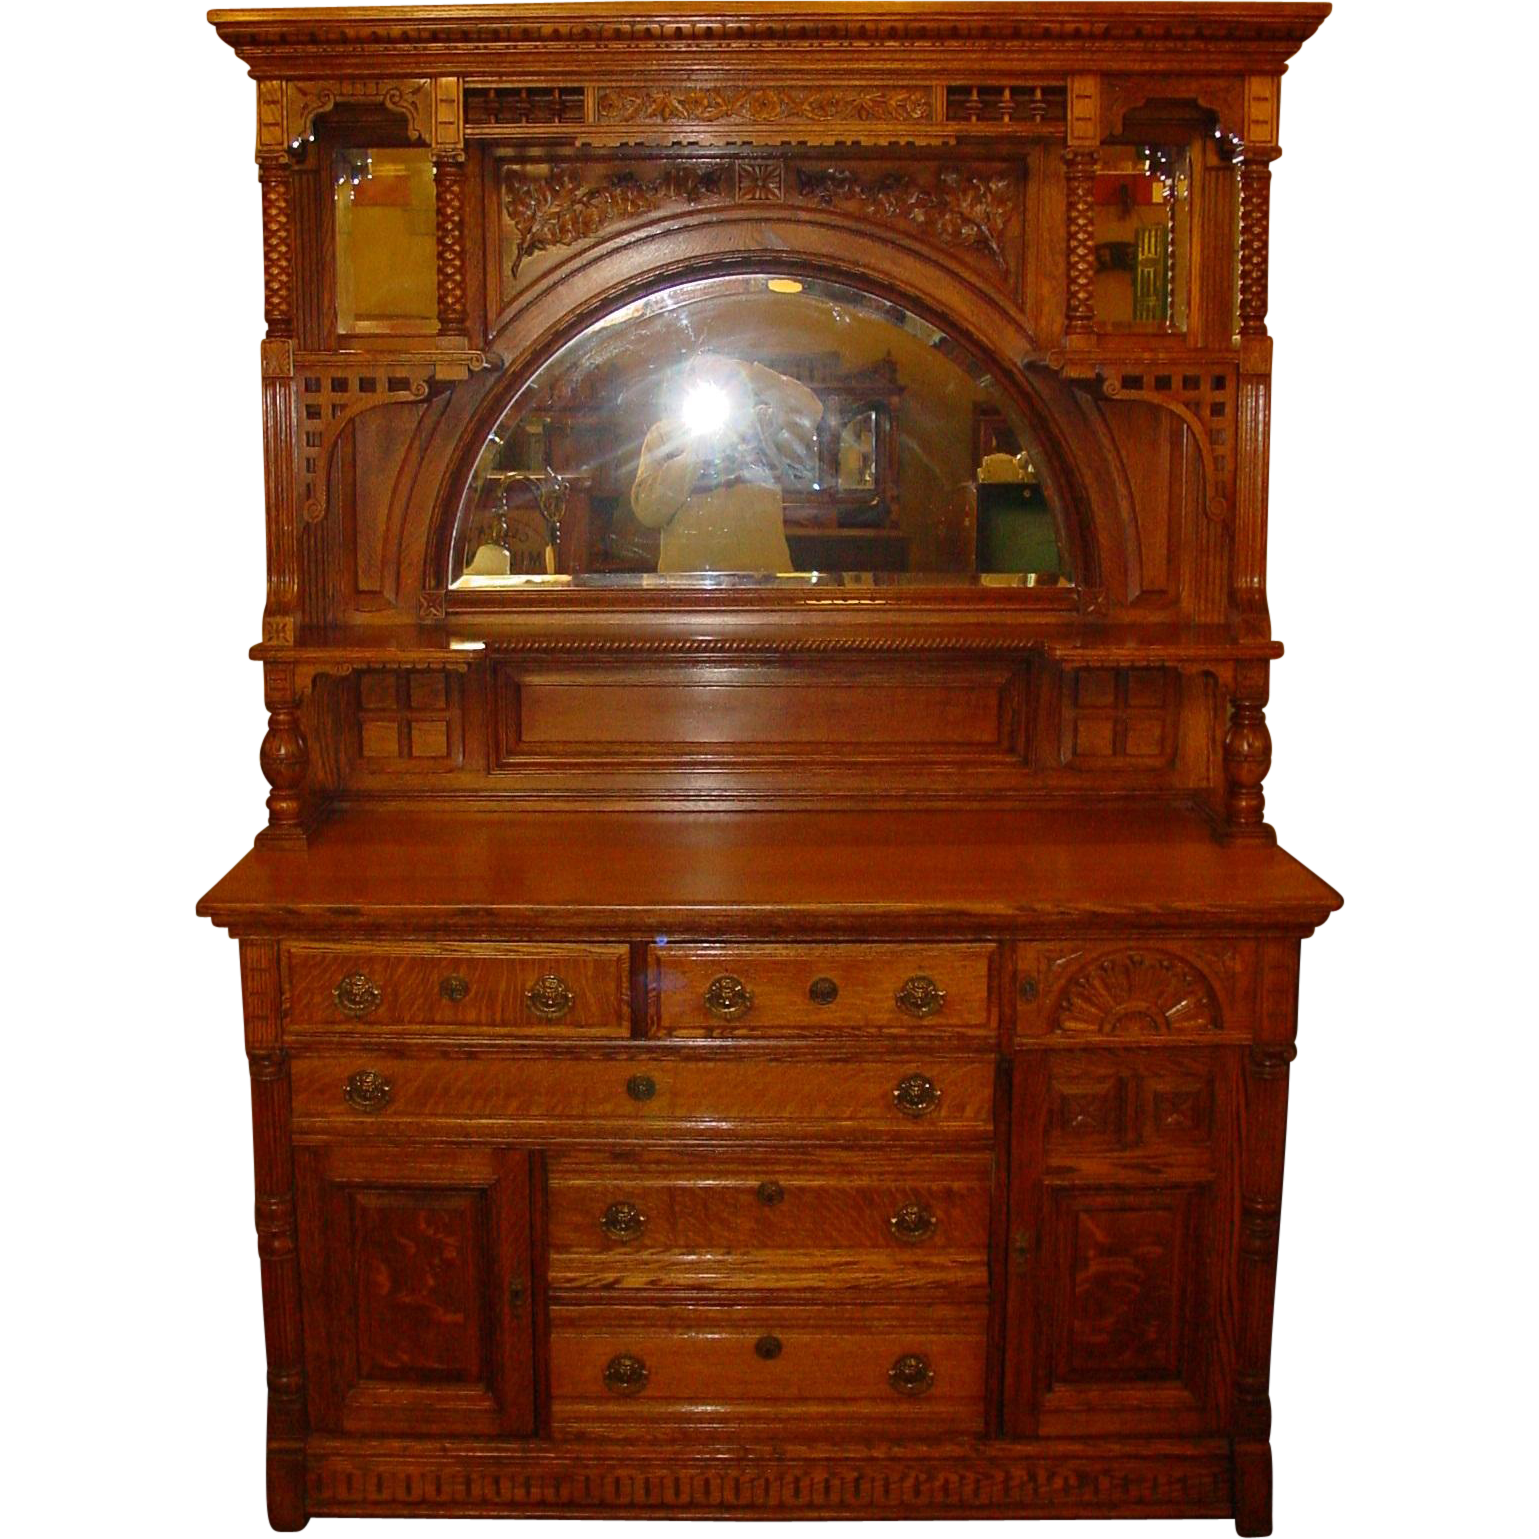 Beautiful quartered quarter sawn carved oak sideboard with built in valuables safe